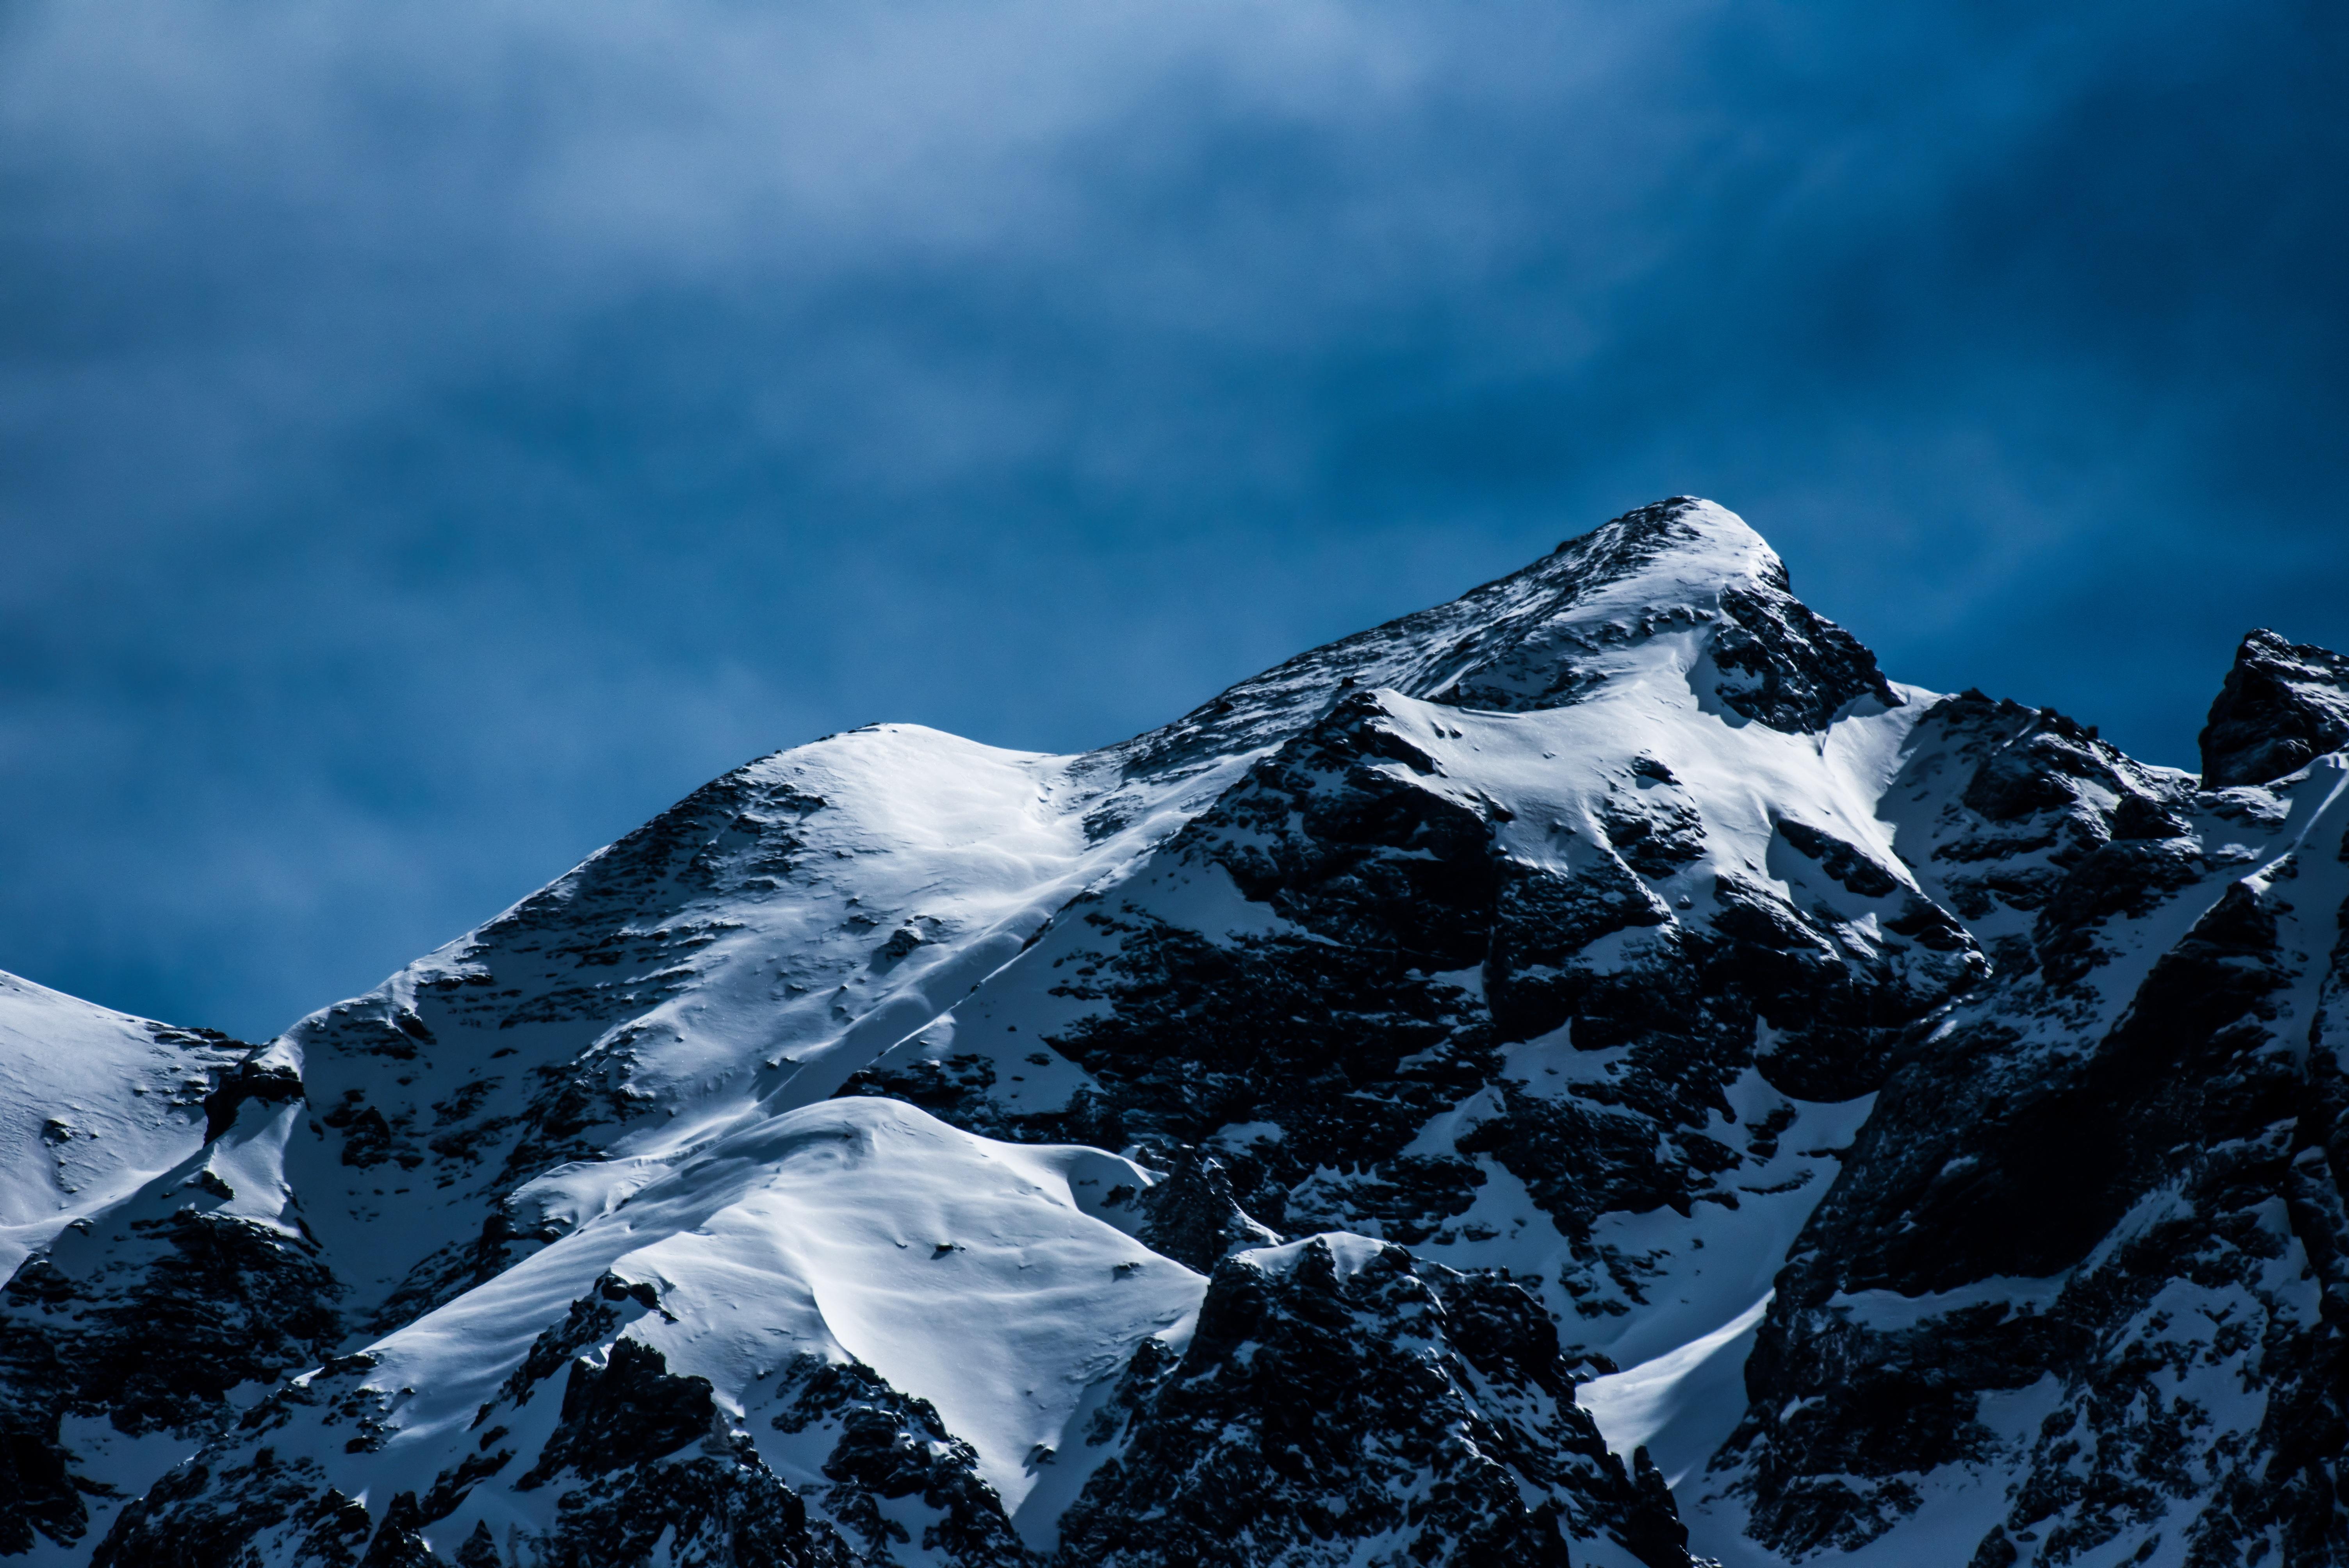 Fondo Escritorio Picos Montañas Nevadas: Fondos De Pantalla : Montañas, Nieve, Invierno, Alpes